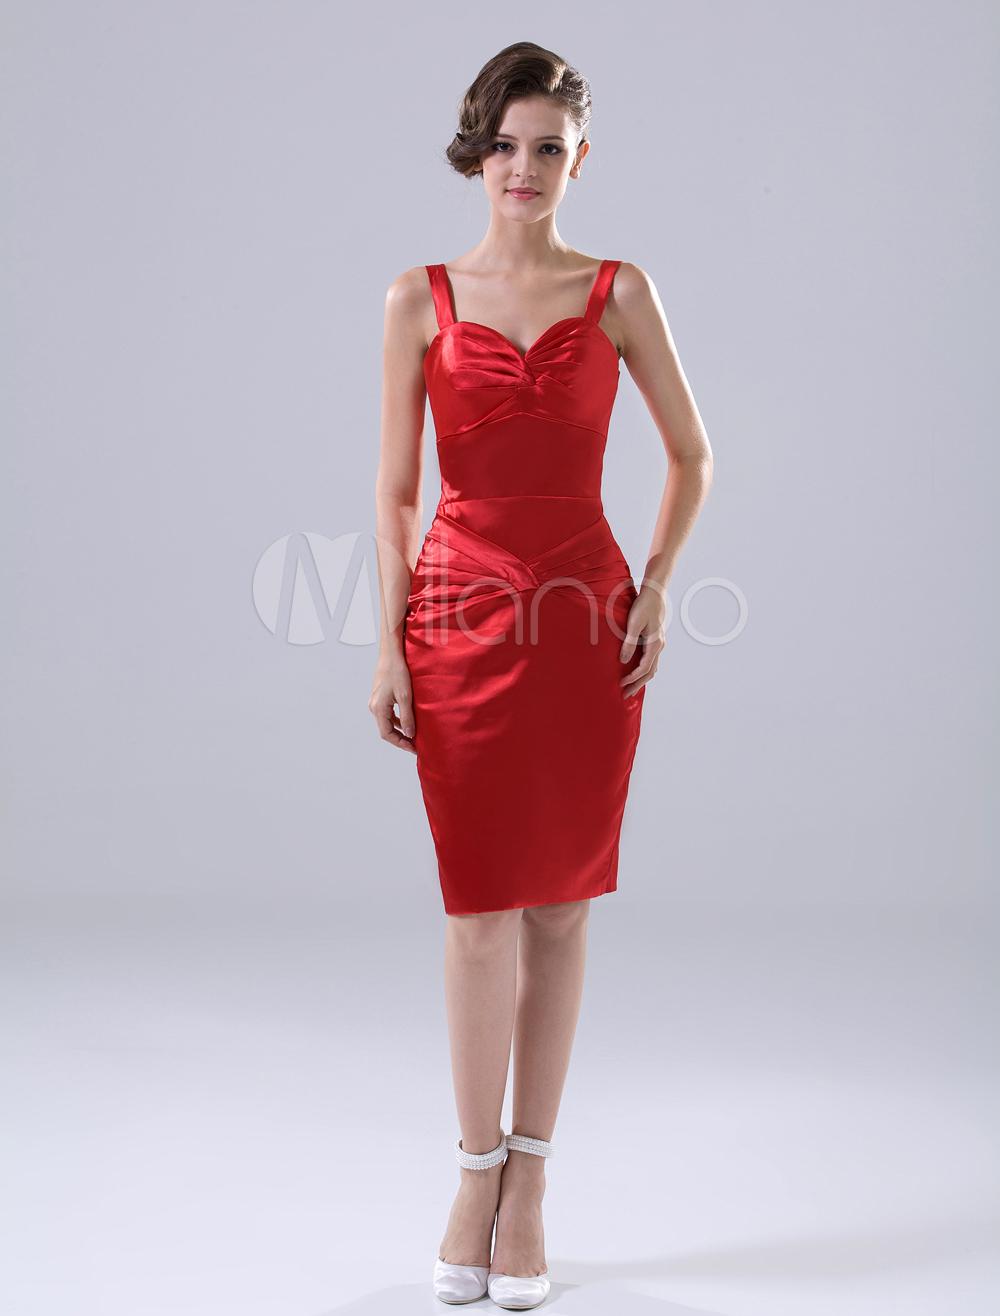 Red Sheath Spaghetti Elastic Woven Satin Cocktail Dress (Wedding Cheap Party Dress) photo